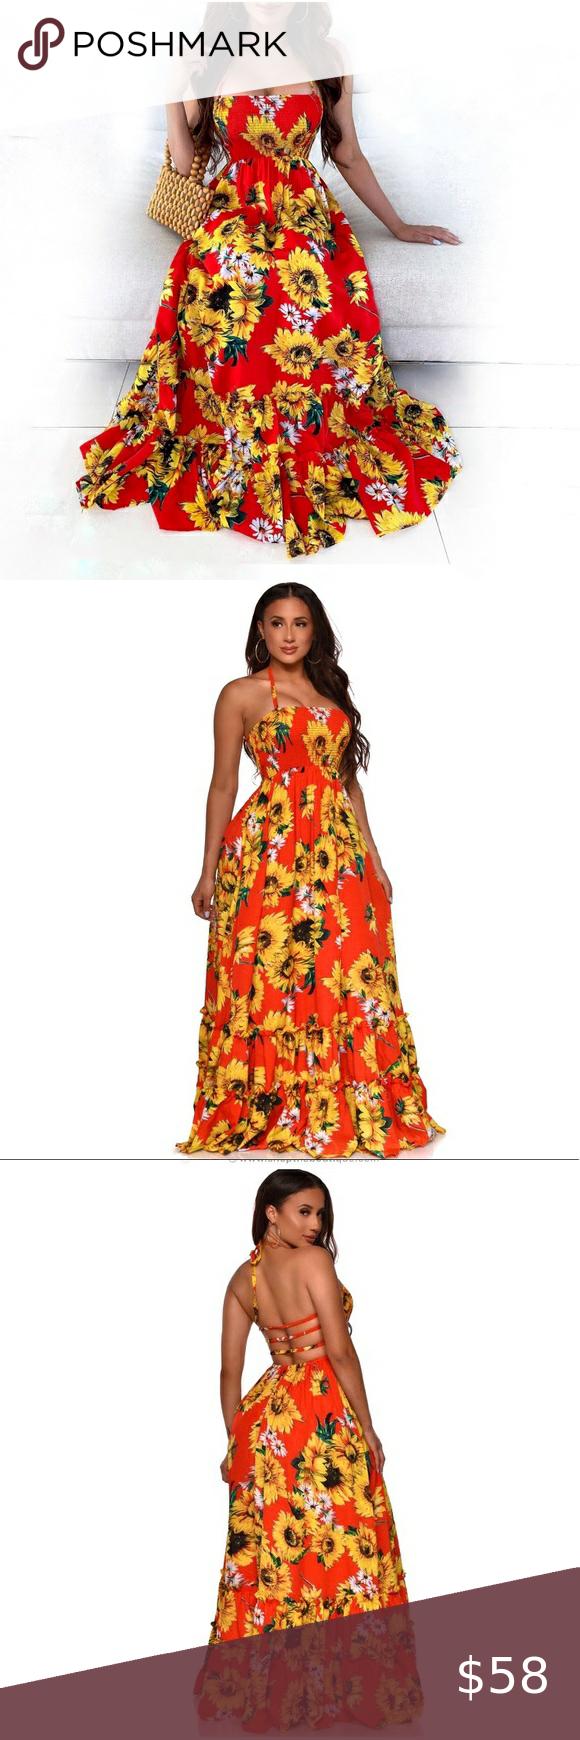 Sunflower Open Back Maxi Dress Sleeveless Sundress Fashion Coral Maxi Dresses Leopard Print Maxi Dress [ 1740 x 580 Pixel ]